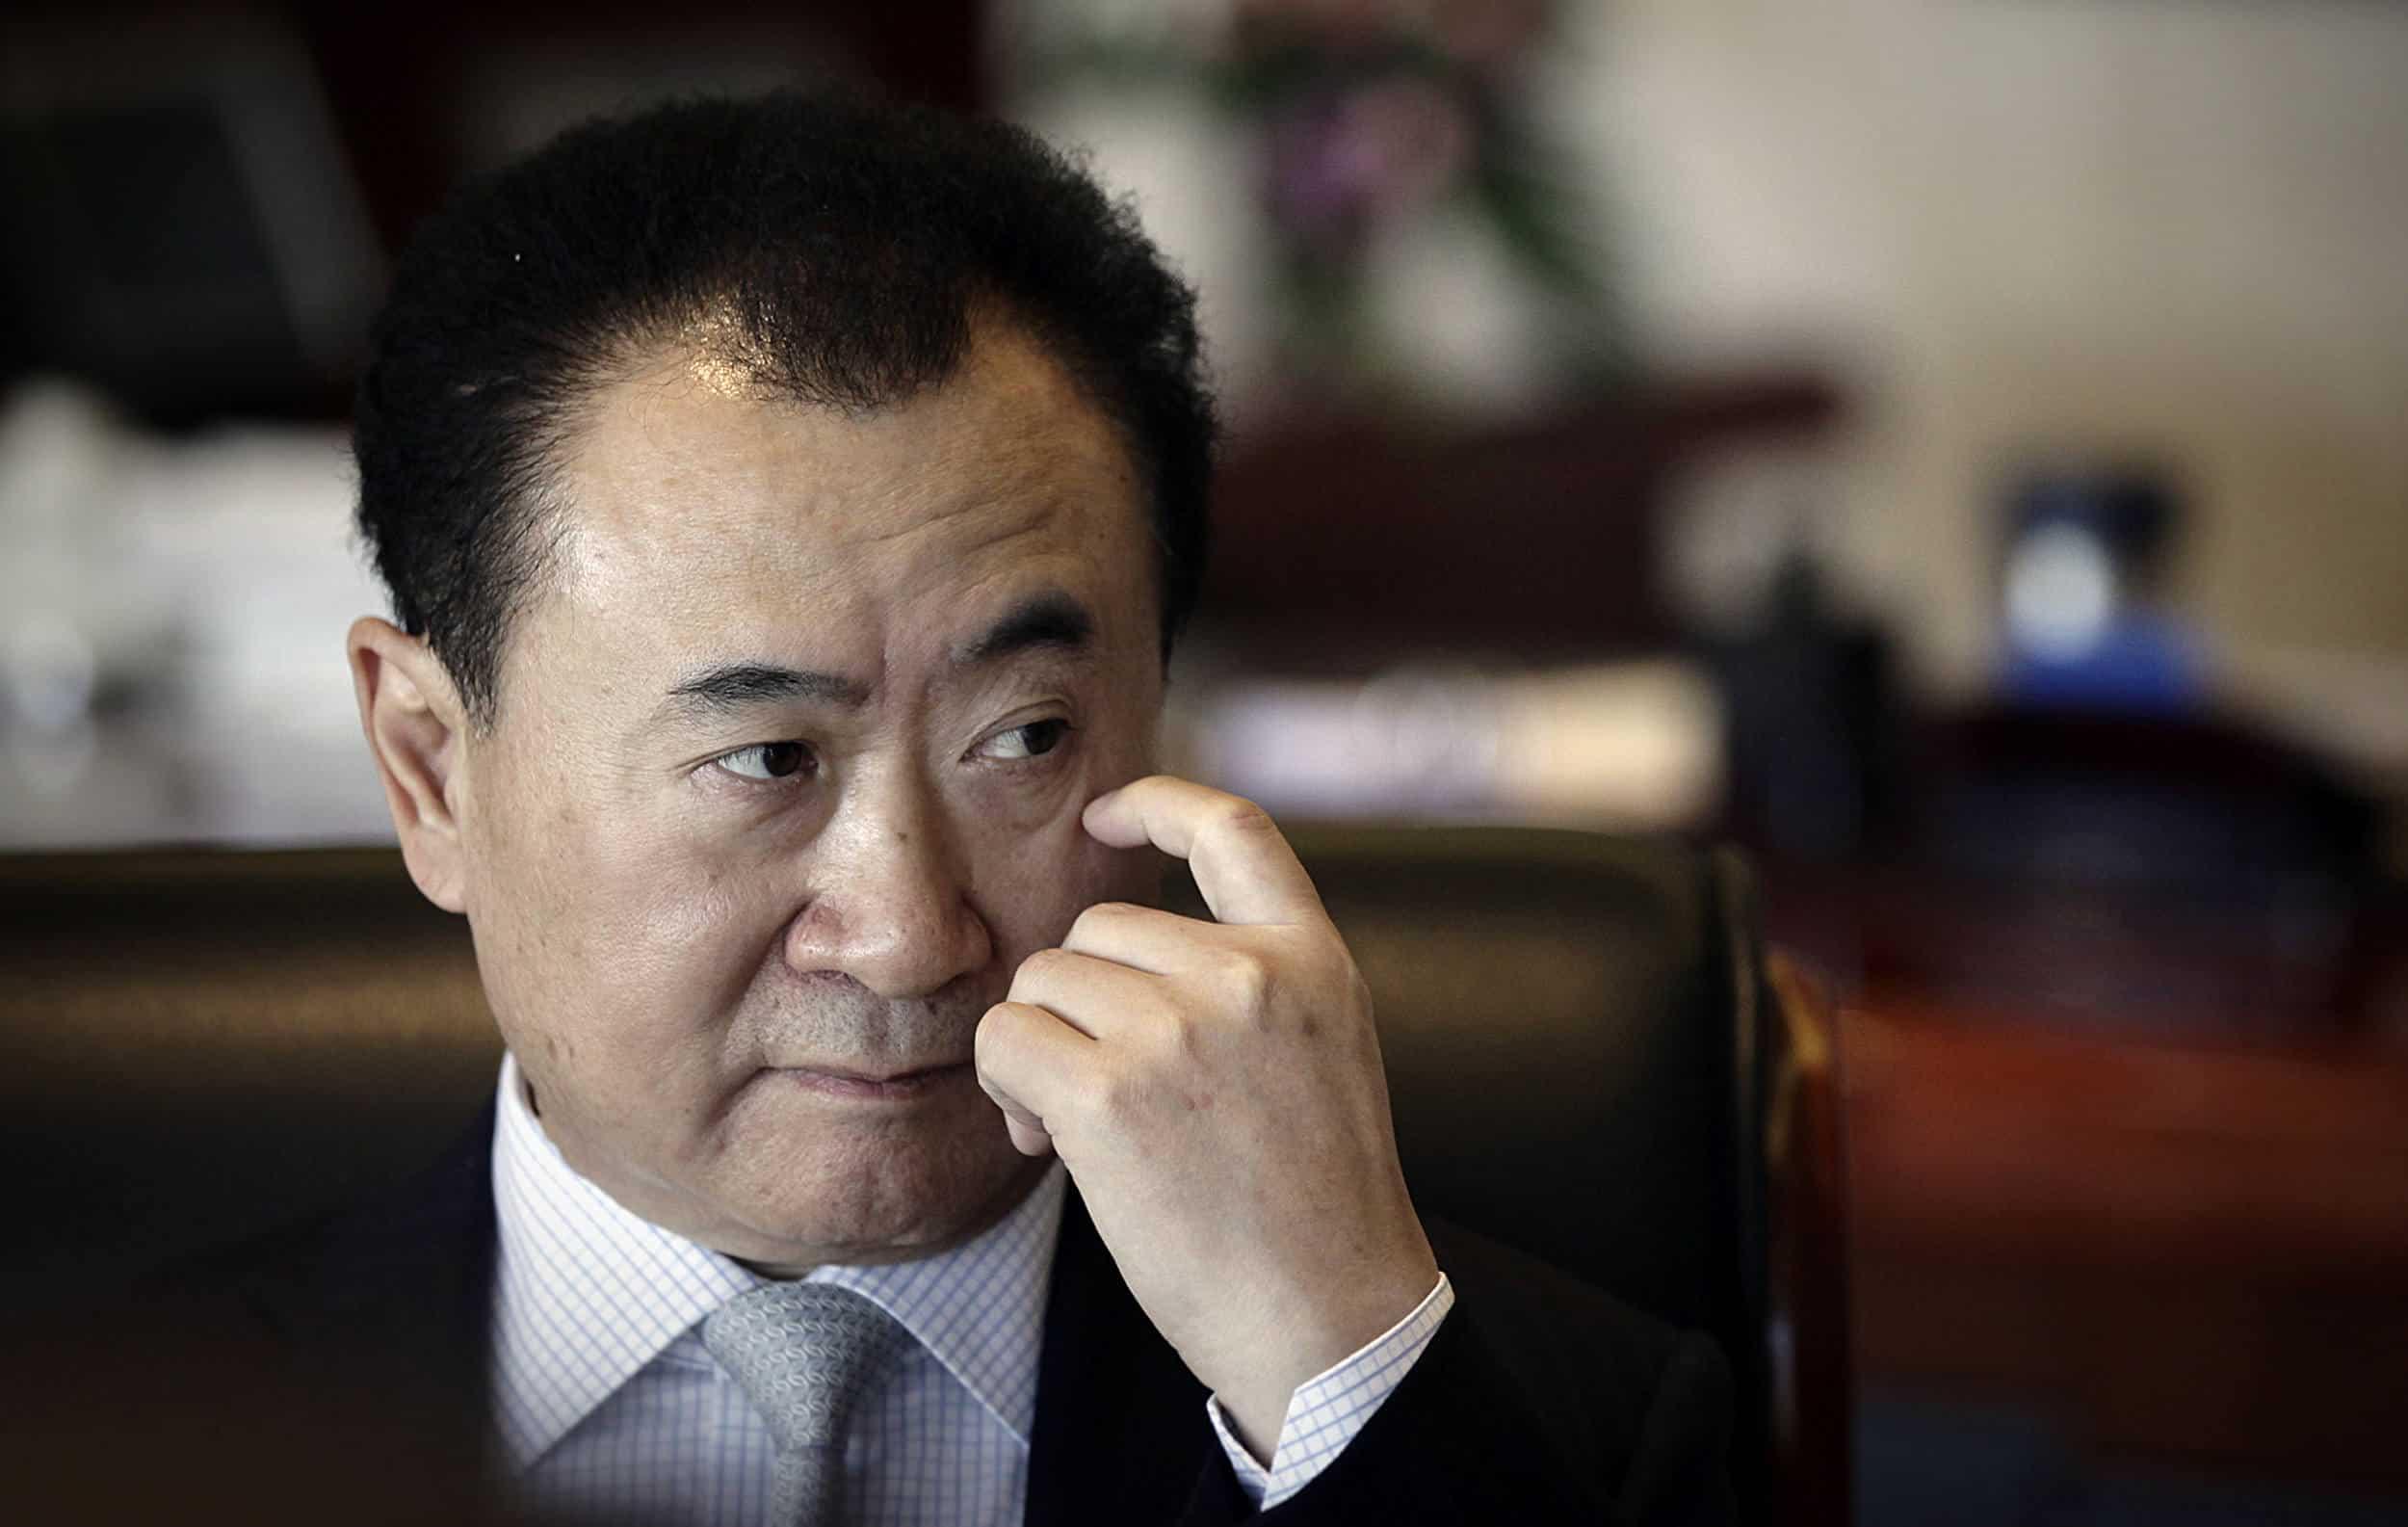 3. Wang Jianlin